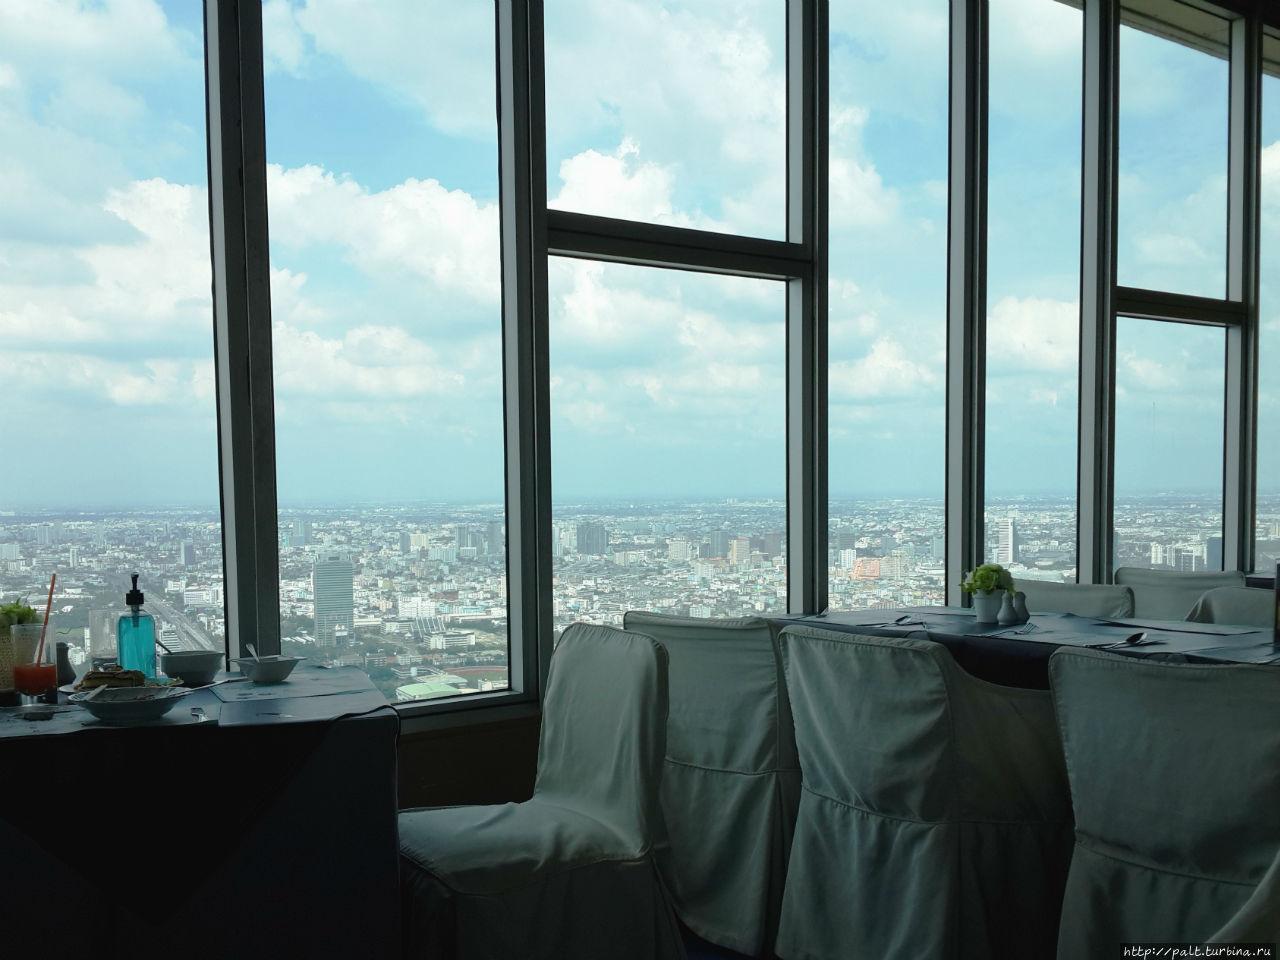 Ресторан на 76 этаже